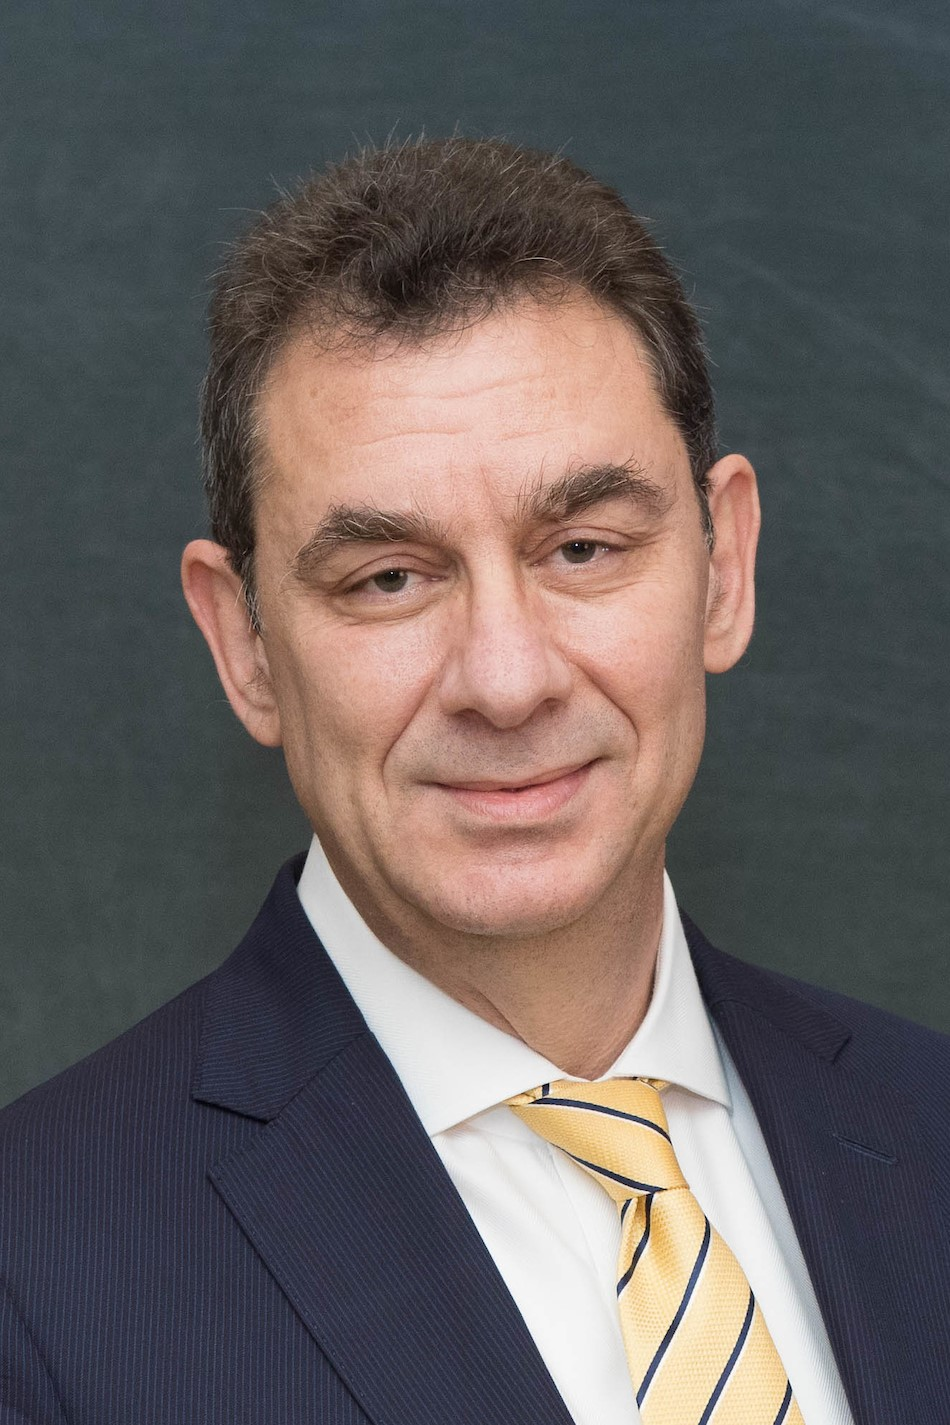 Dr. Albert Bourla